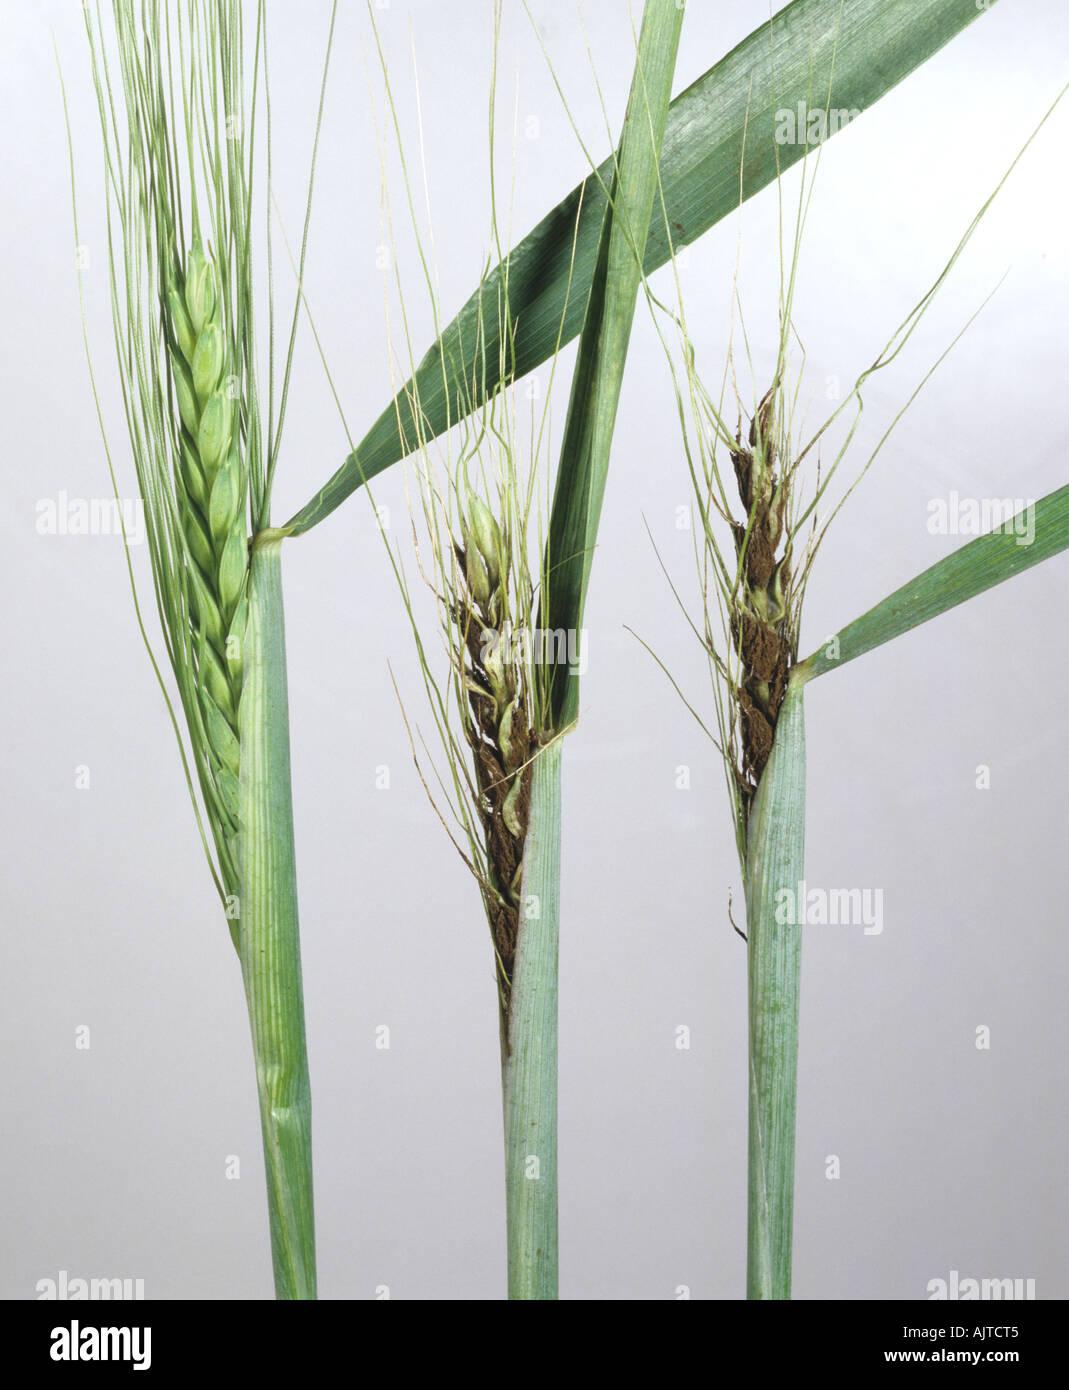 Loose smut Ustilago nuda on bearded wheat ears - Stock Image